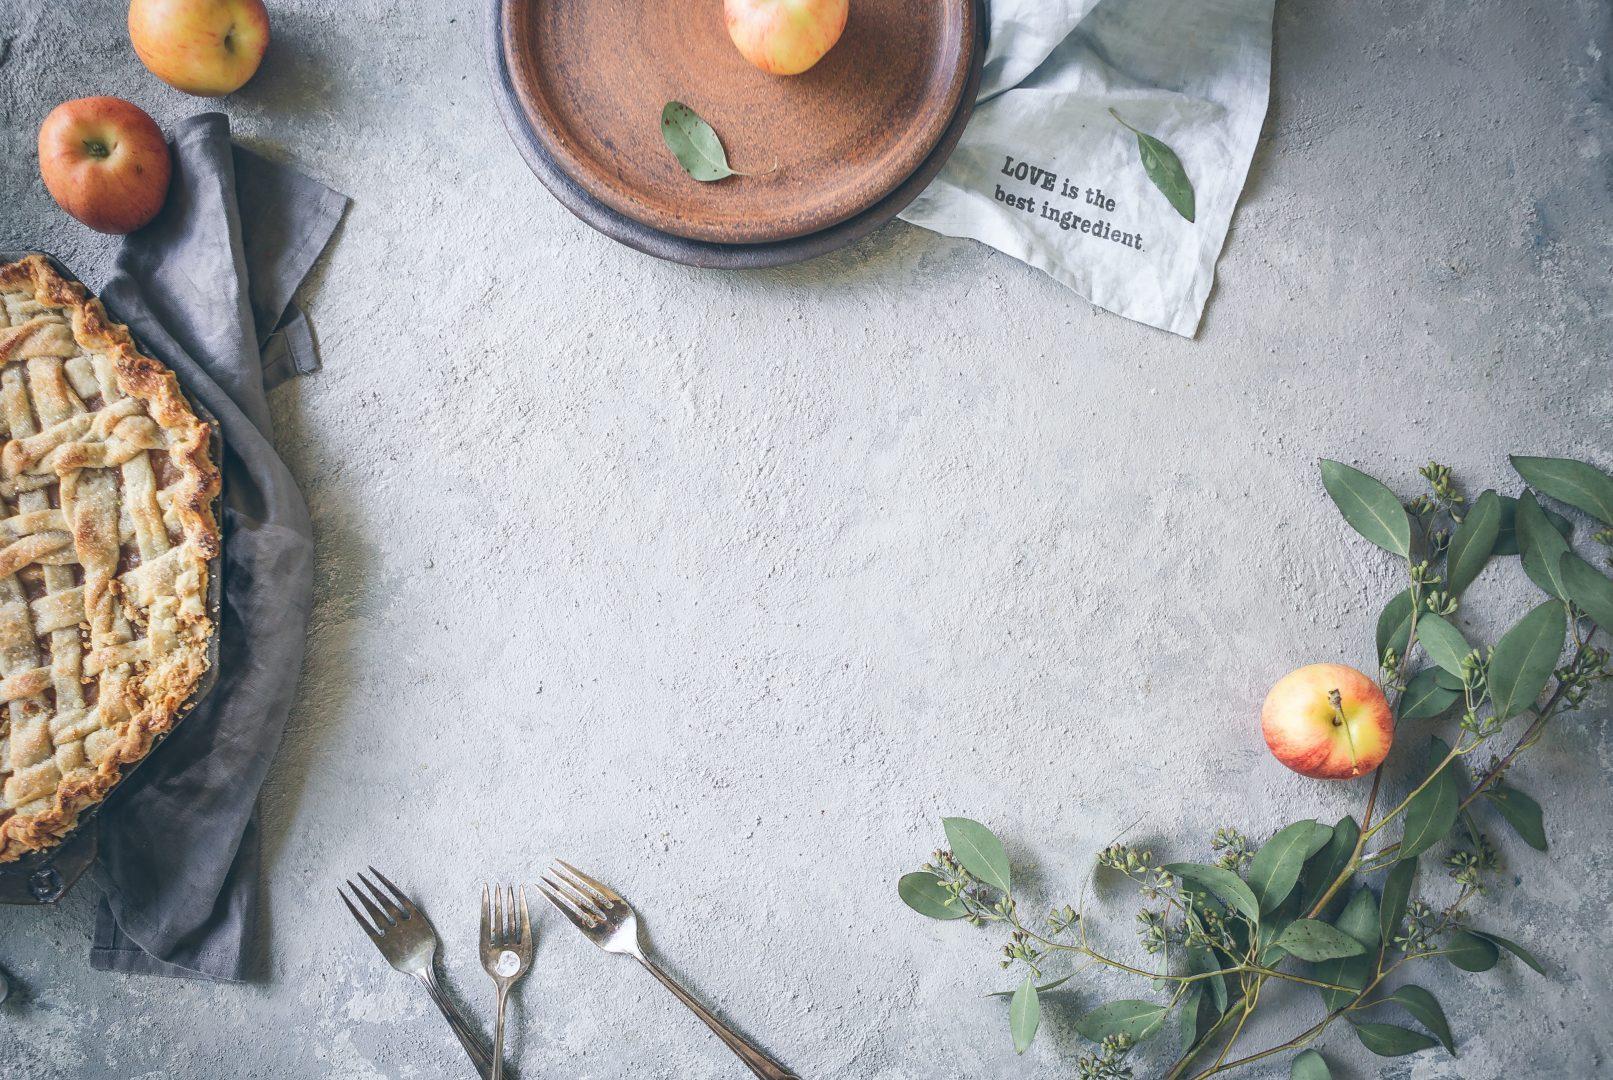 three stainless steel forks near apple